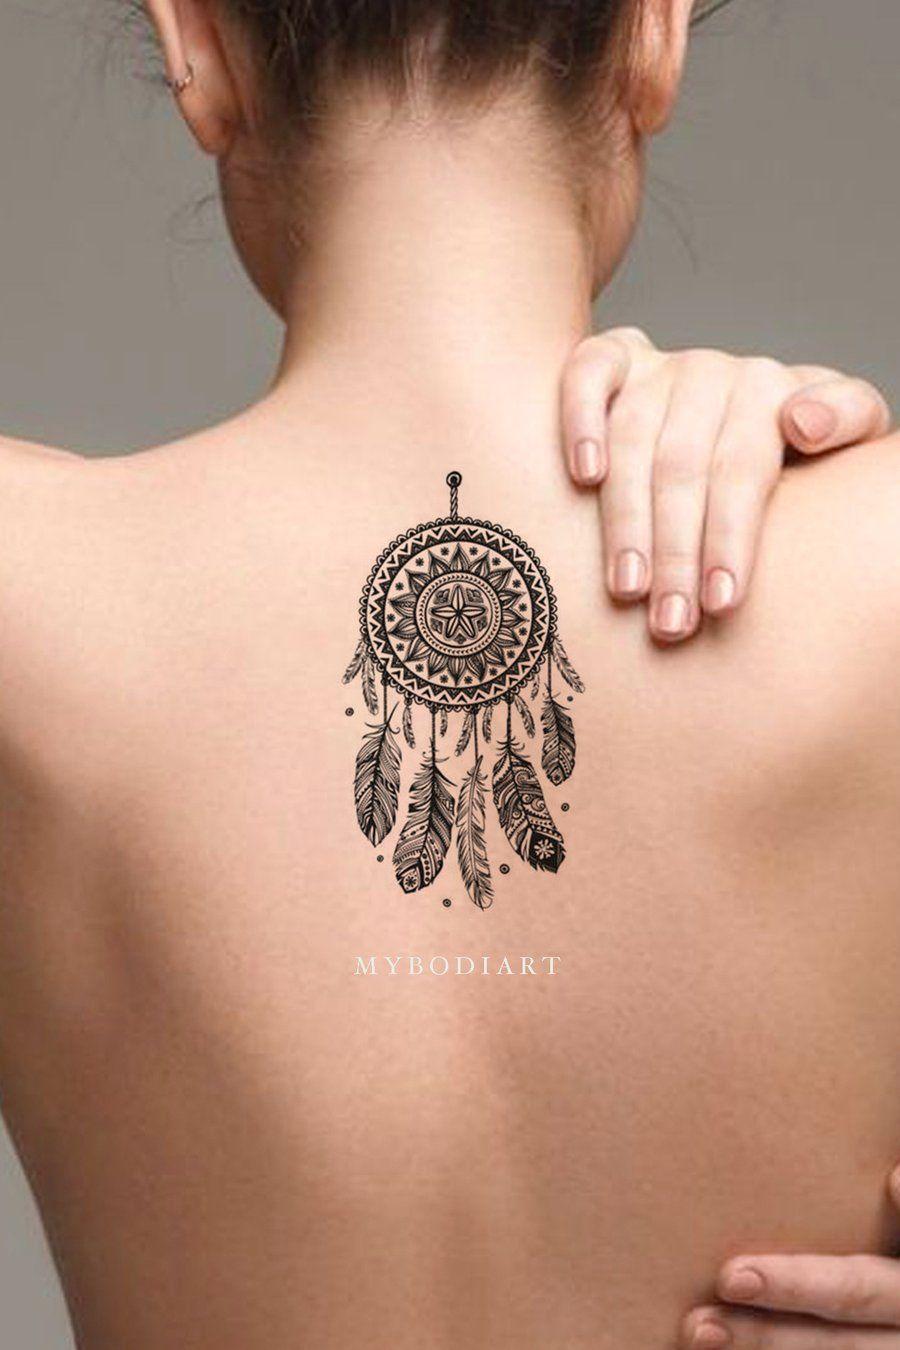 c55155a52 Cool Black Henna Dreamcatcher Back Spine Tattoo Ideas for Women -  www.MyBodiArt.com